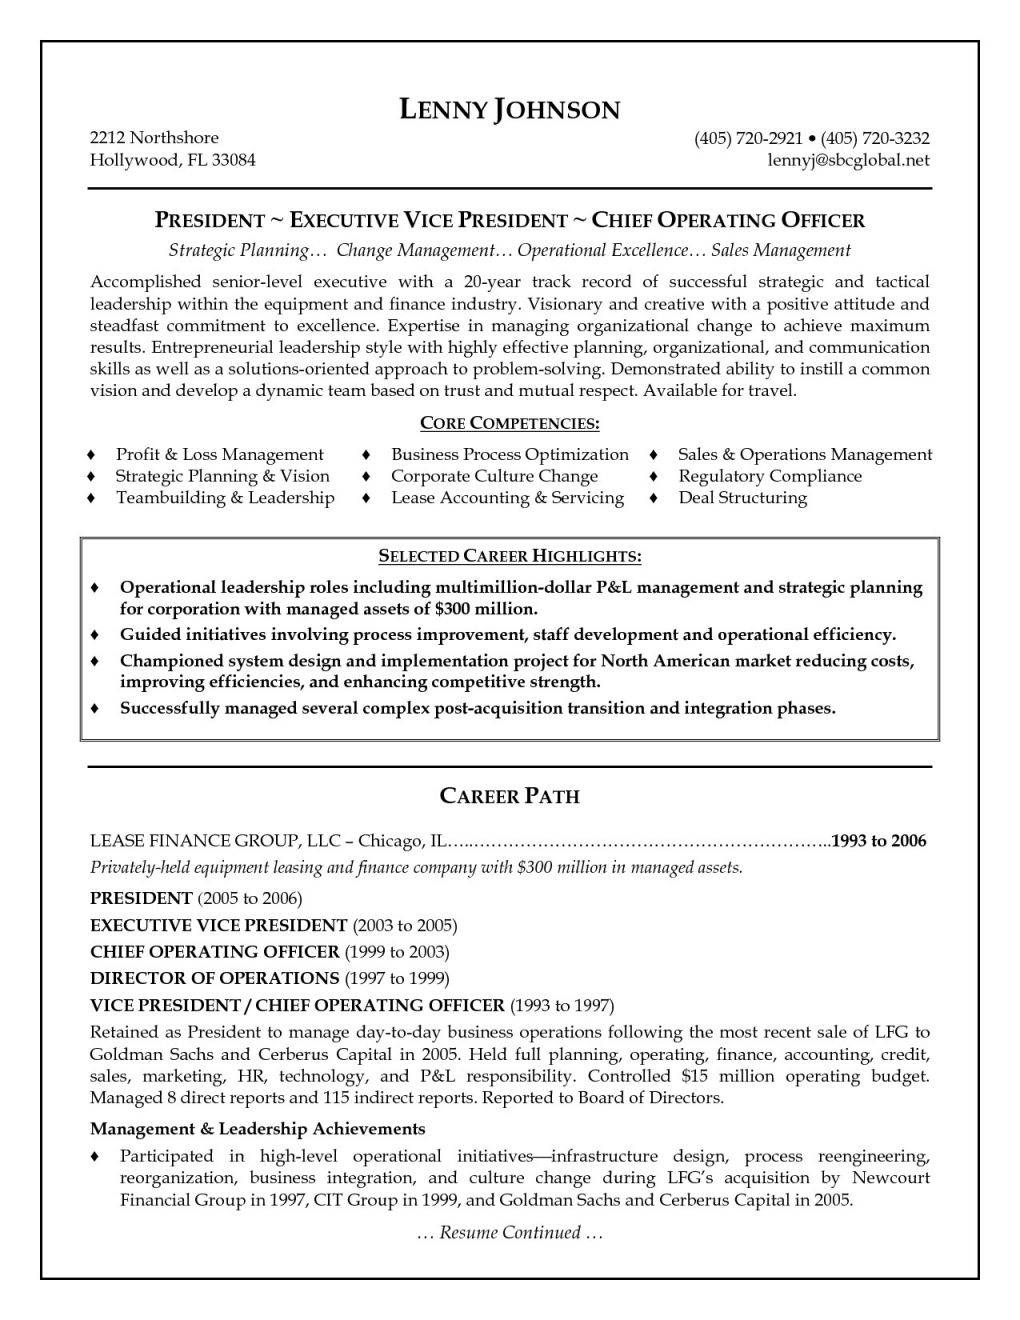 Post Acquisition Integration Plan Template